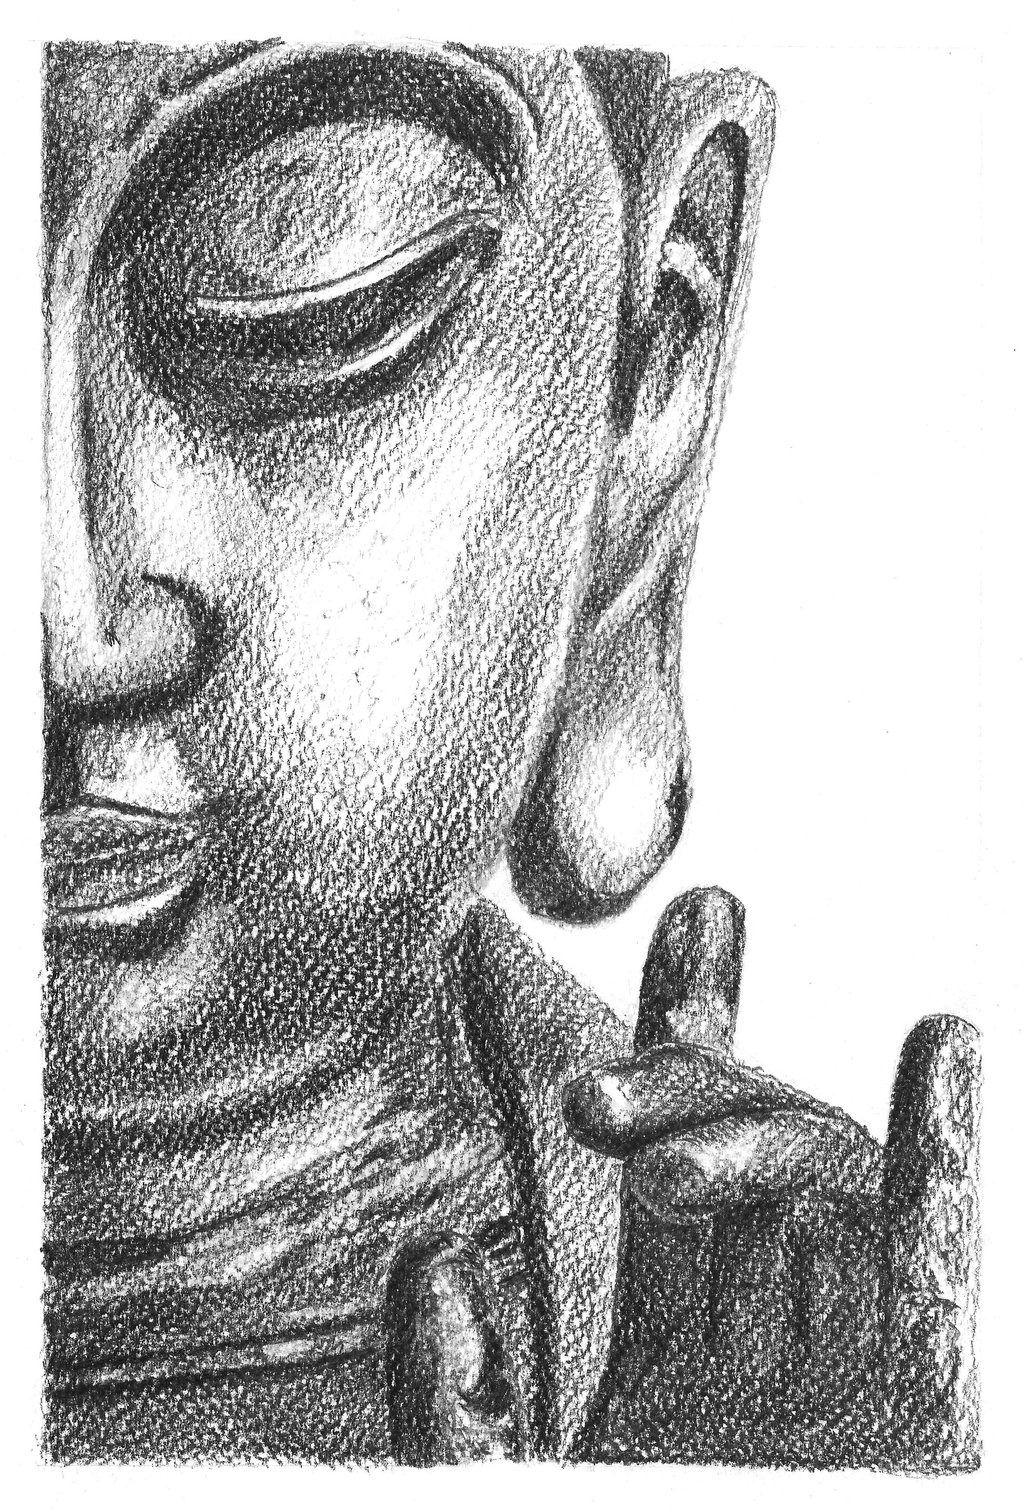 Pin by Makenzie Payne on ॐP e ac e ☯ in 2019 | Buddha ...